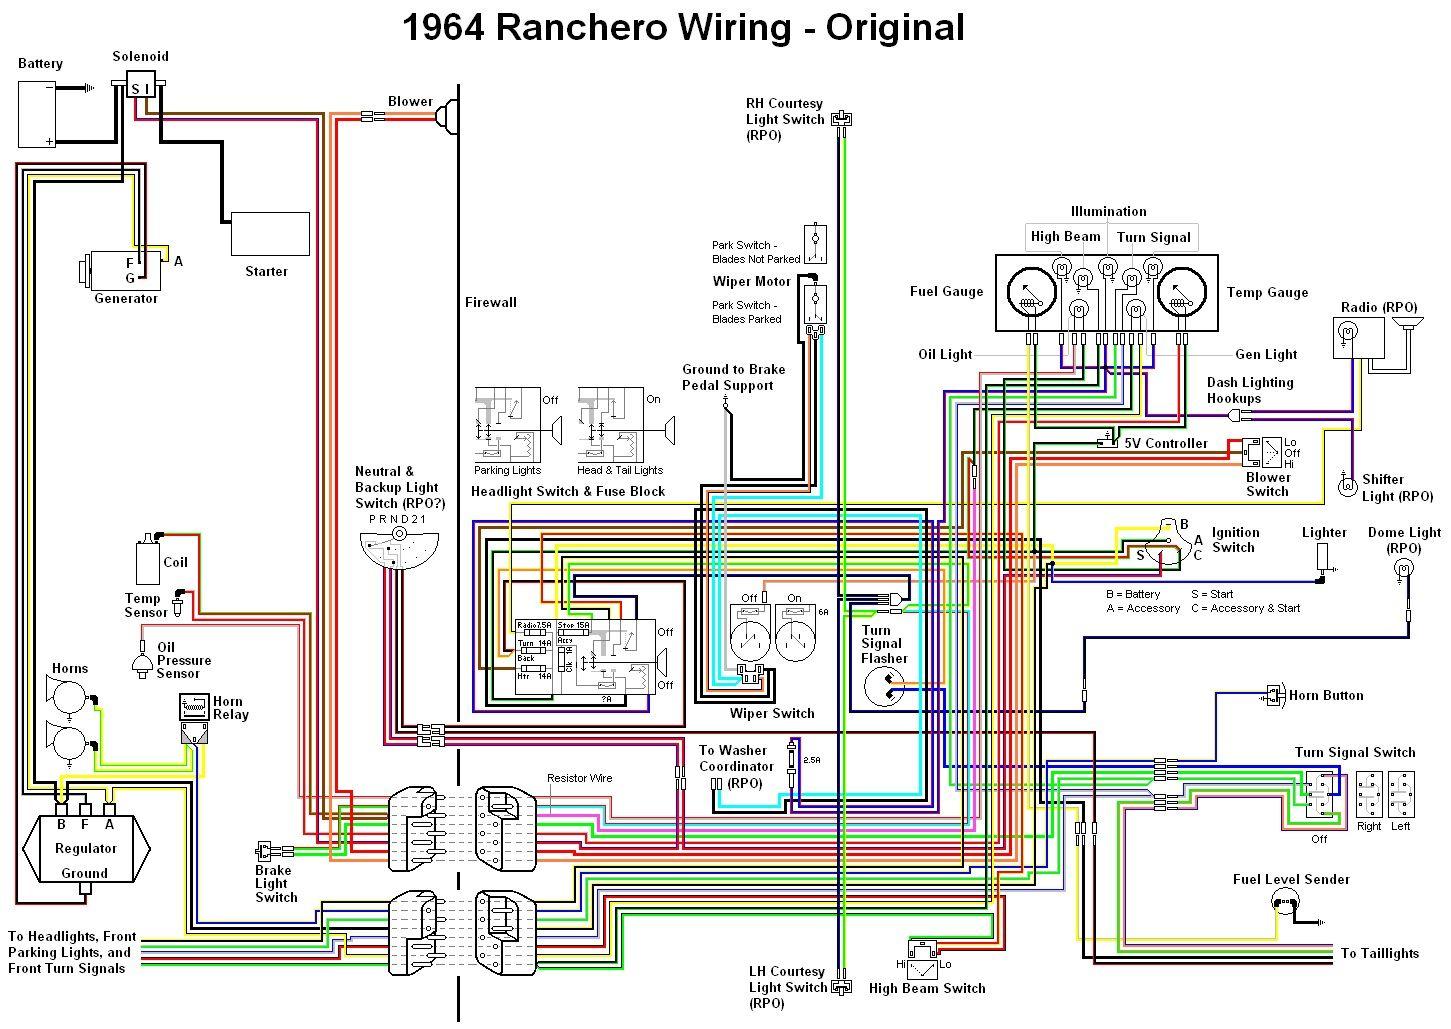 Ford Au Wiring Diagram - 79 Ford Bronco Solenoid Wiring Diagram -  caprice.losdol2.jeanjaures37.frWiring Diagram Resource